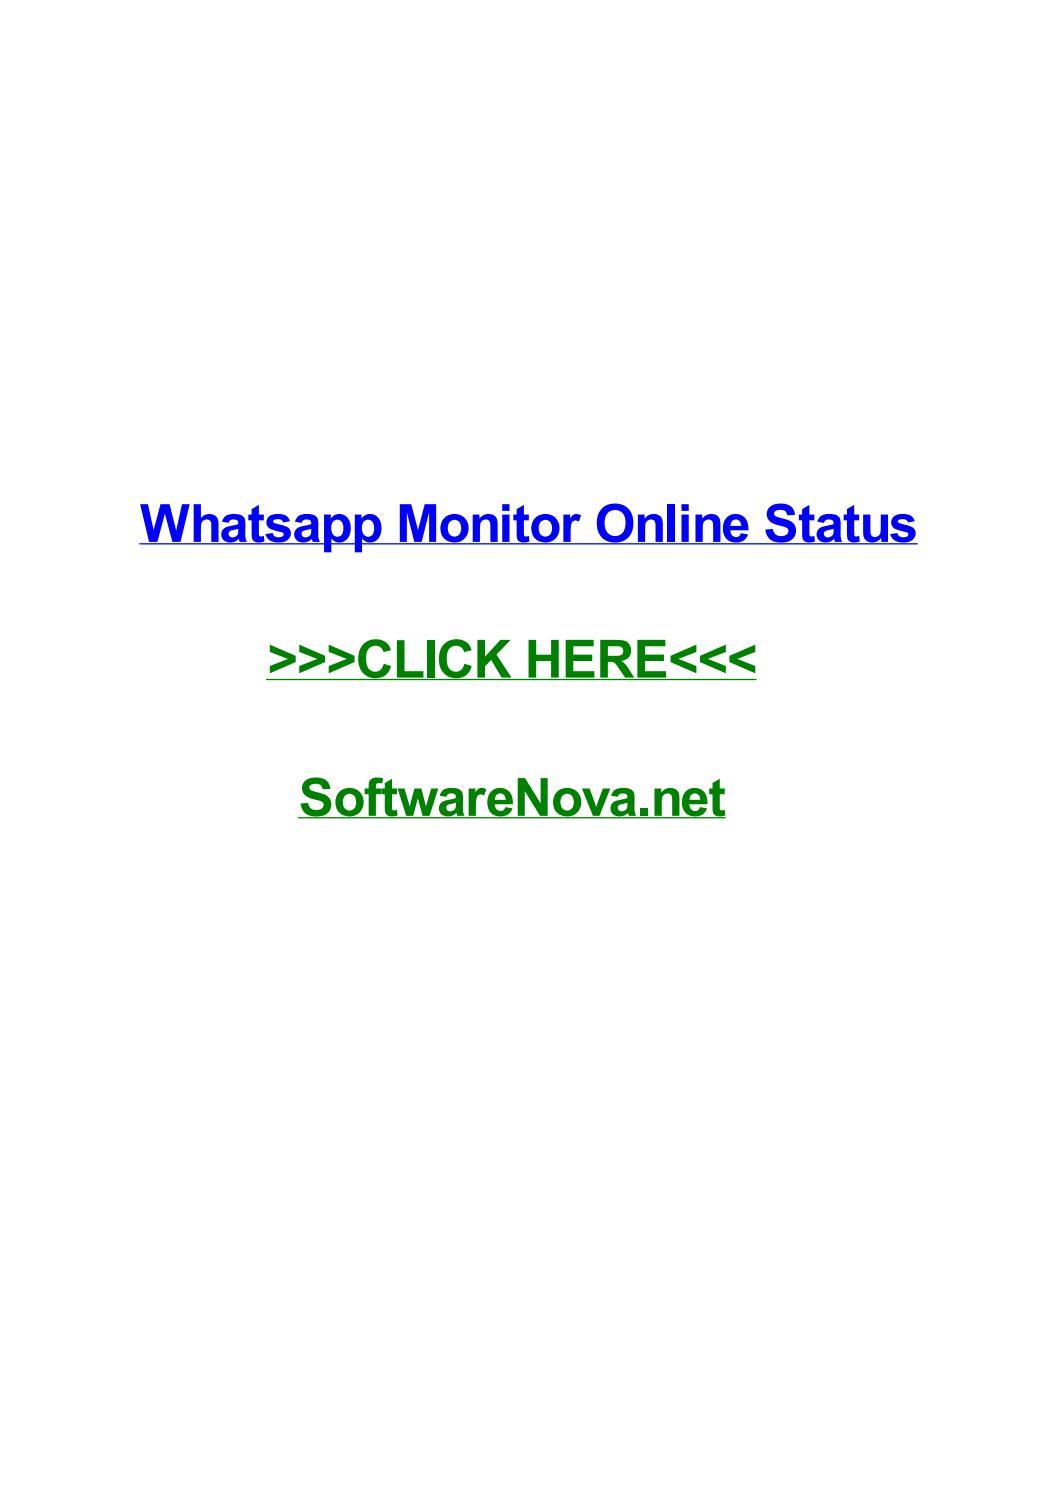 Whatsapp Monitor Online Status By Arturonucmm Issuu